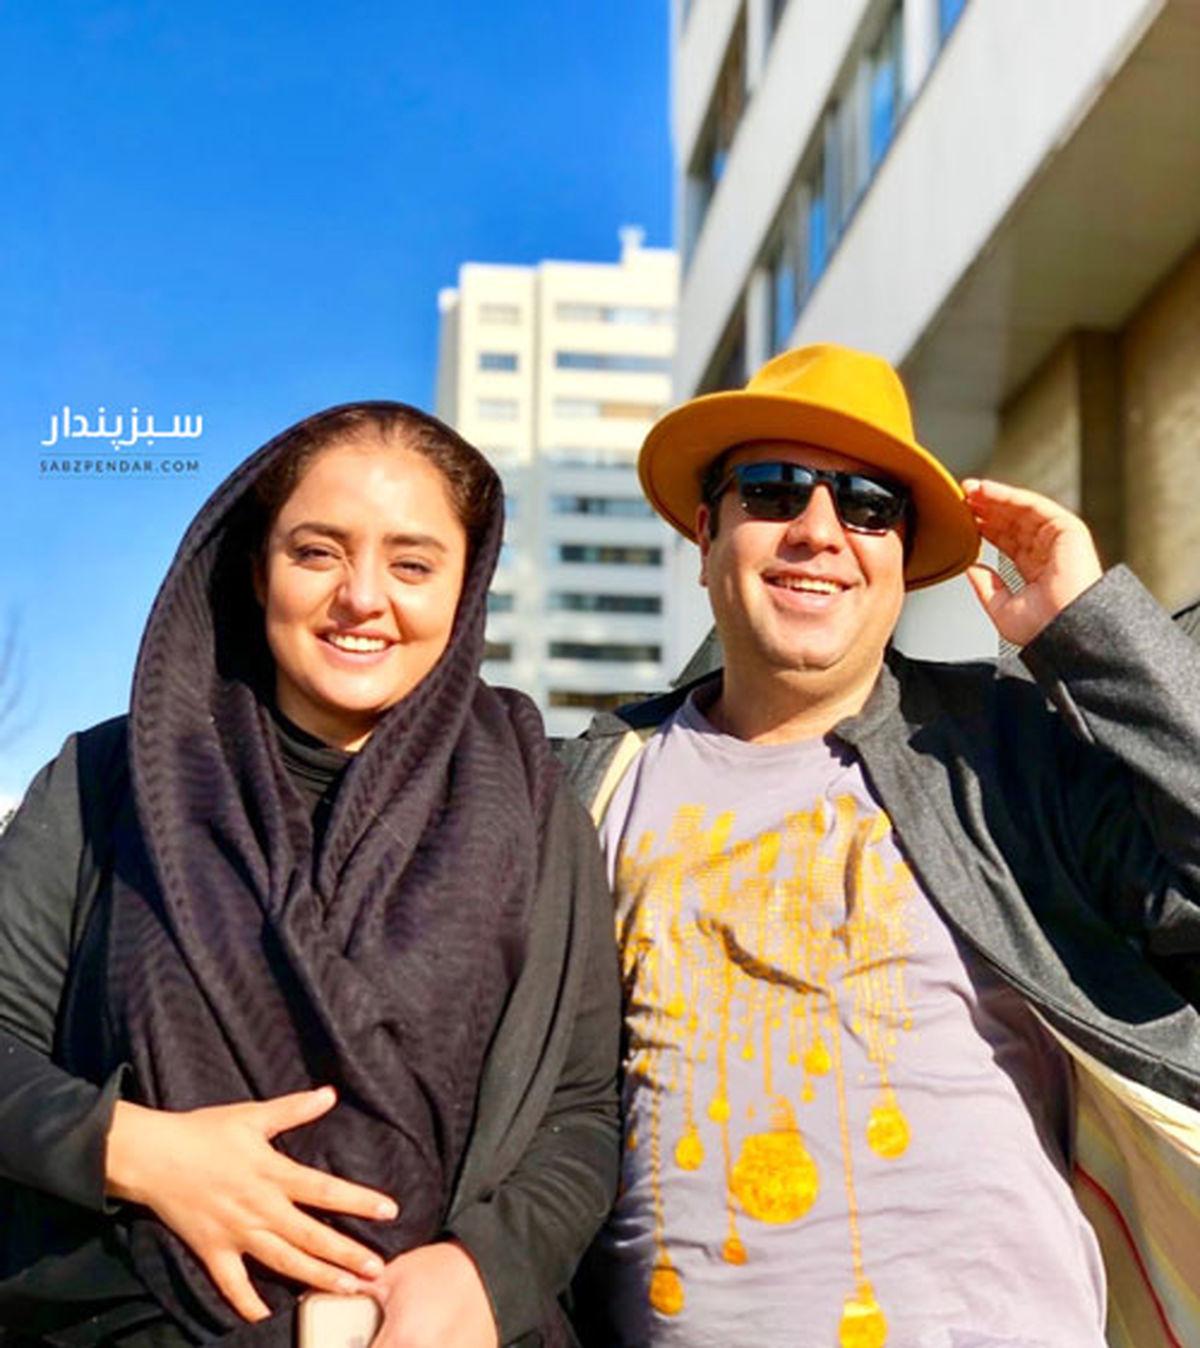 دورهمی نرگس محمدی و همسرش در کنار نسیم ادبی